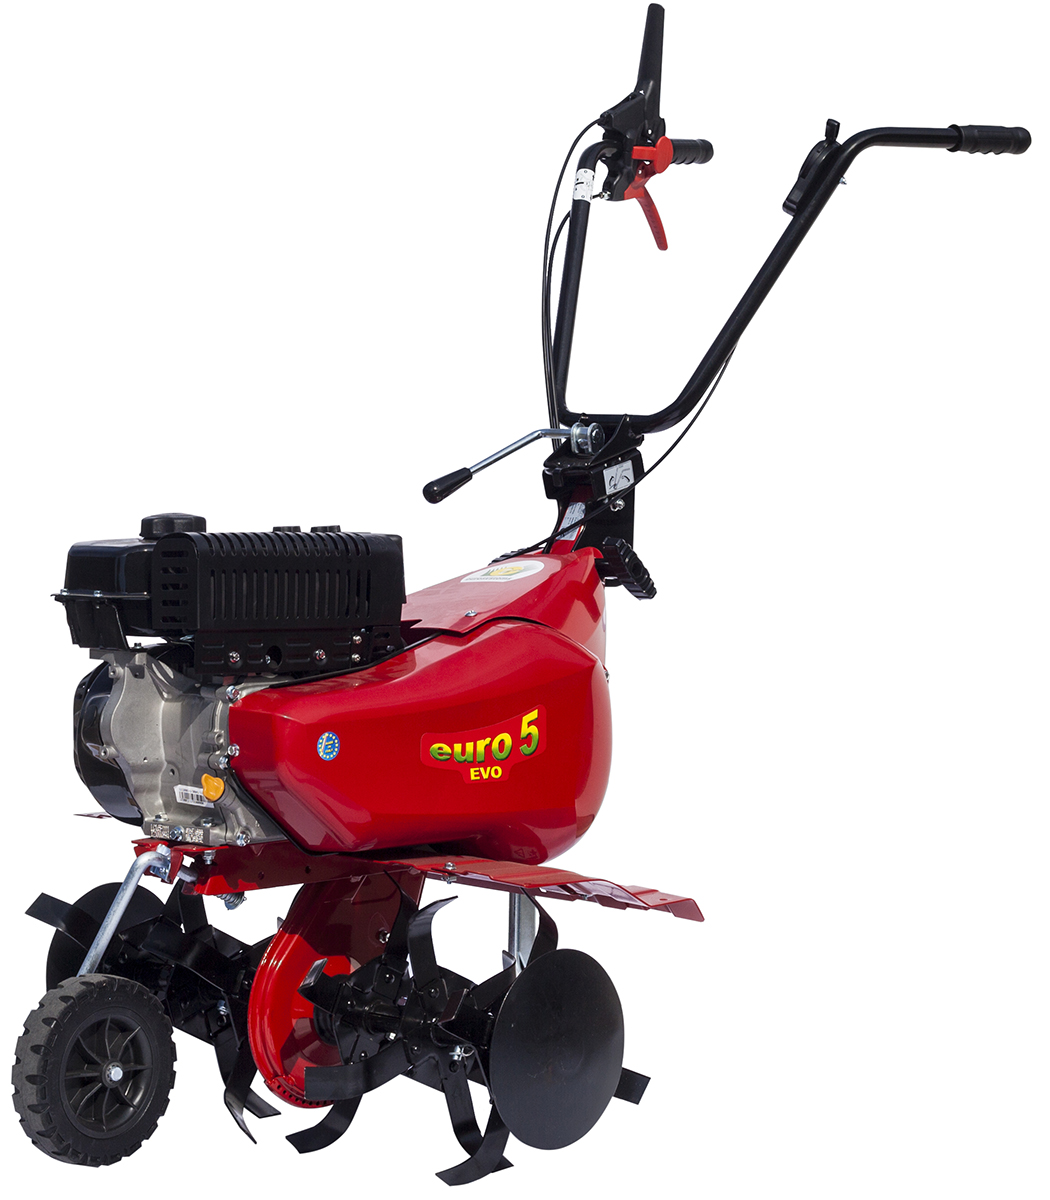 цена на Мотокультиватор Eurosystems Euro-5 EVO RM S/R Loncin TM60, цвет: красный